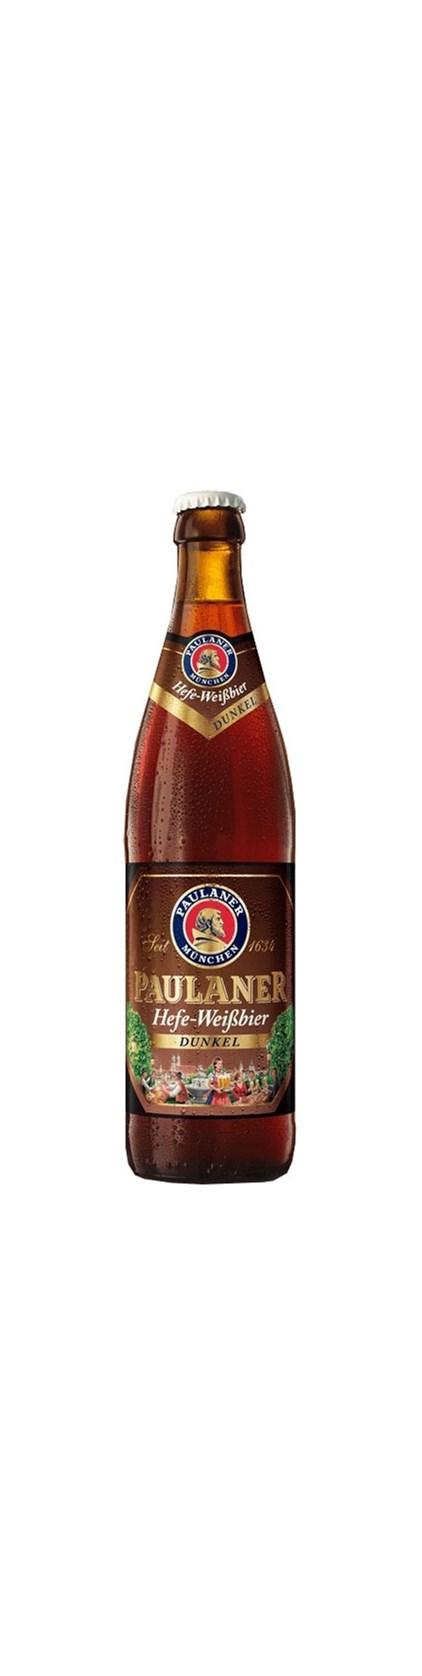 Paulaner Hefe Weiss Dunkel